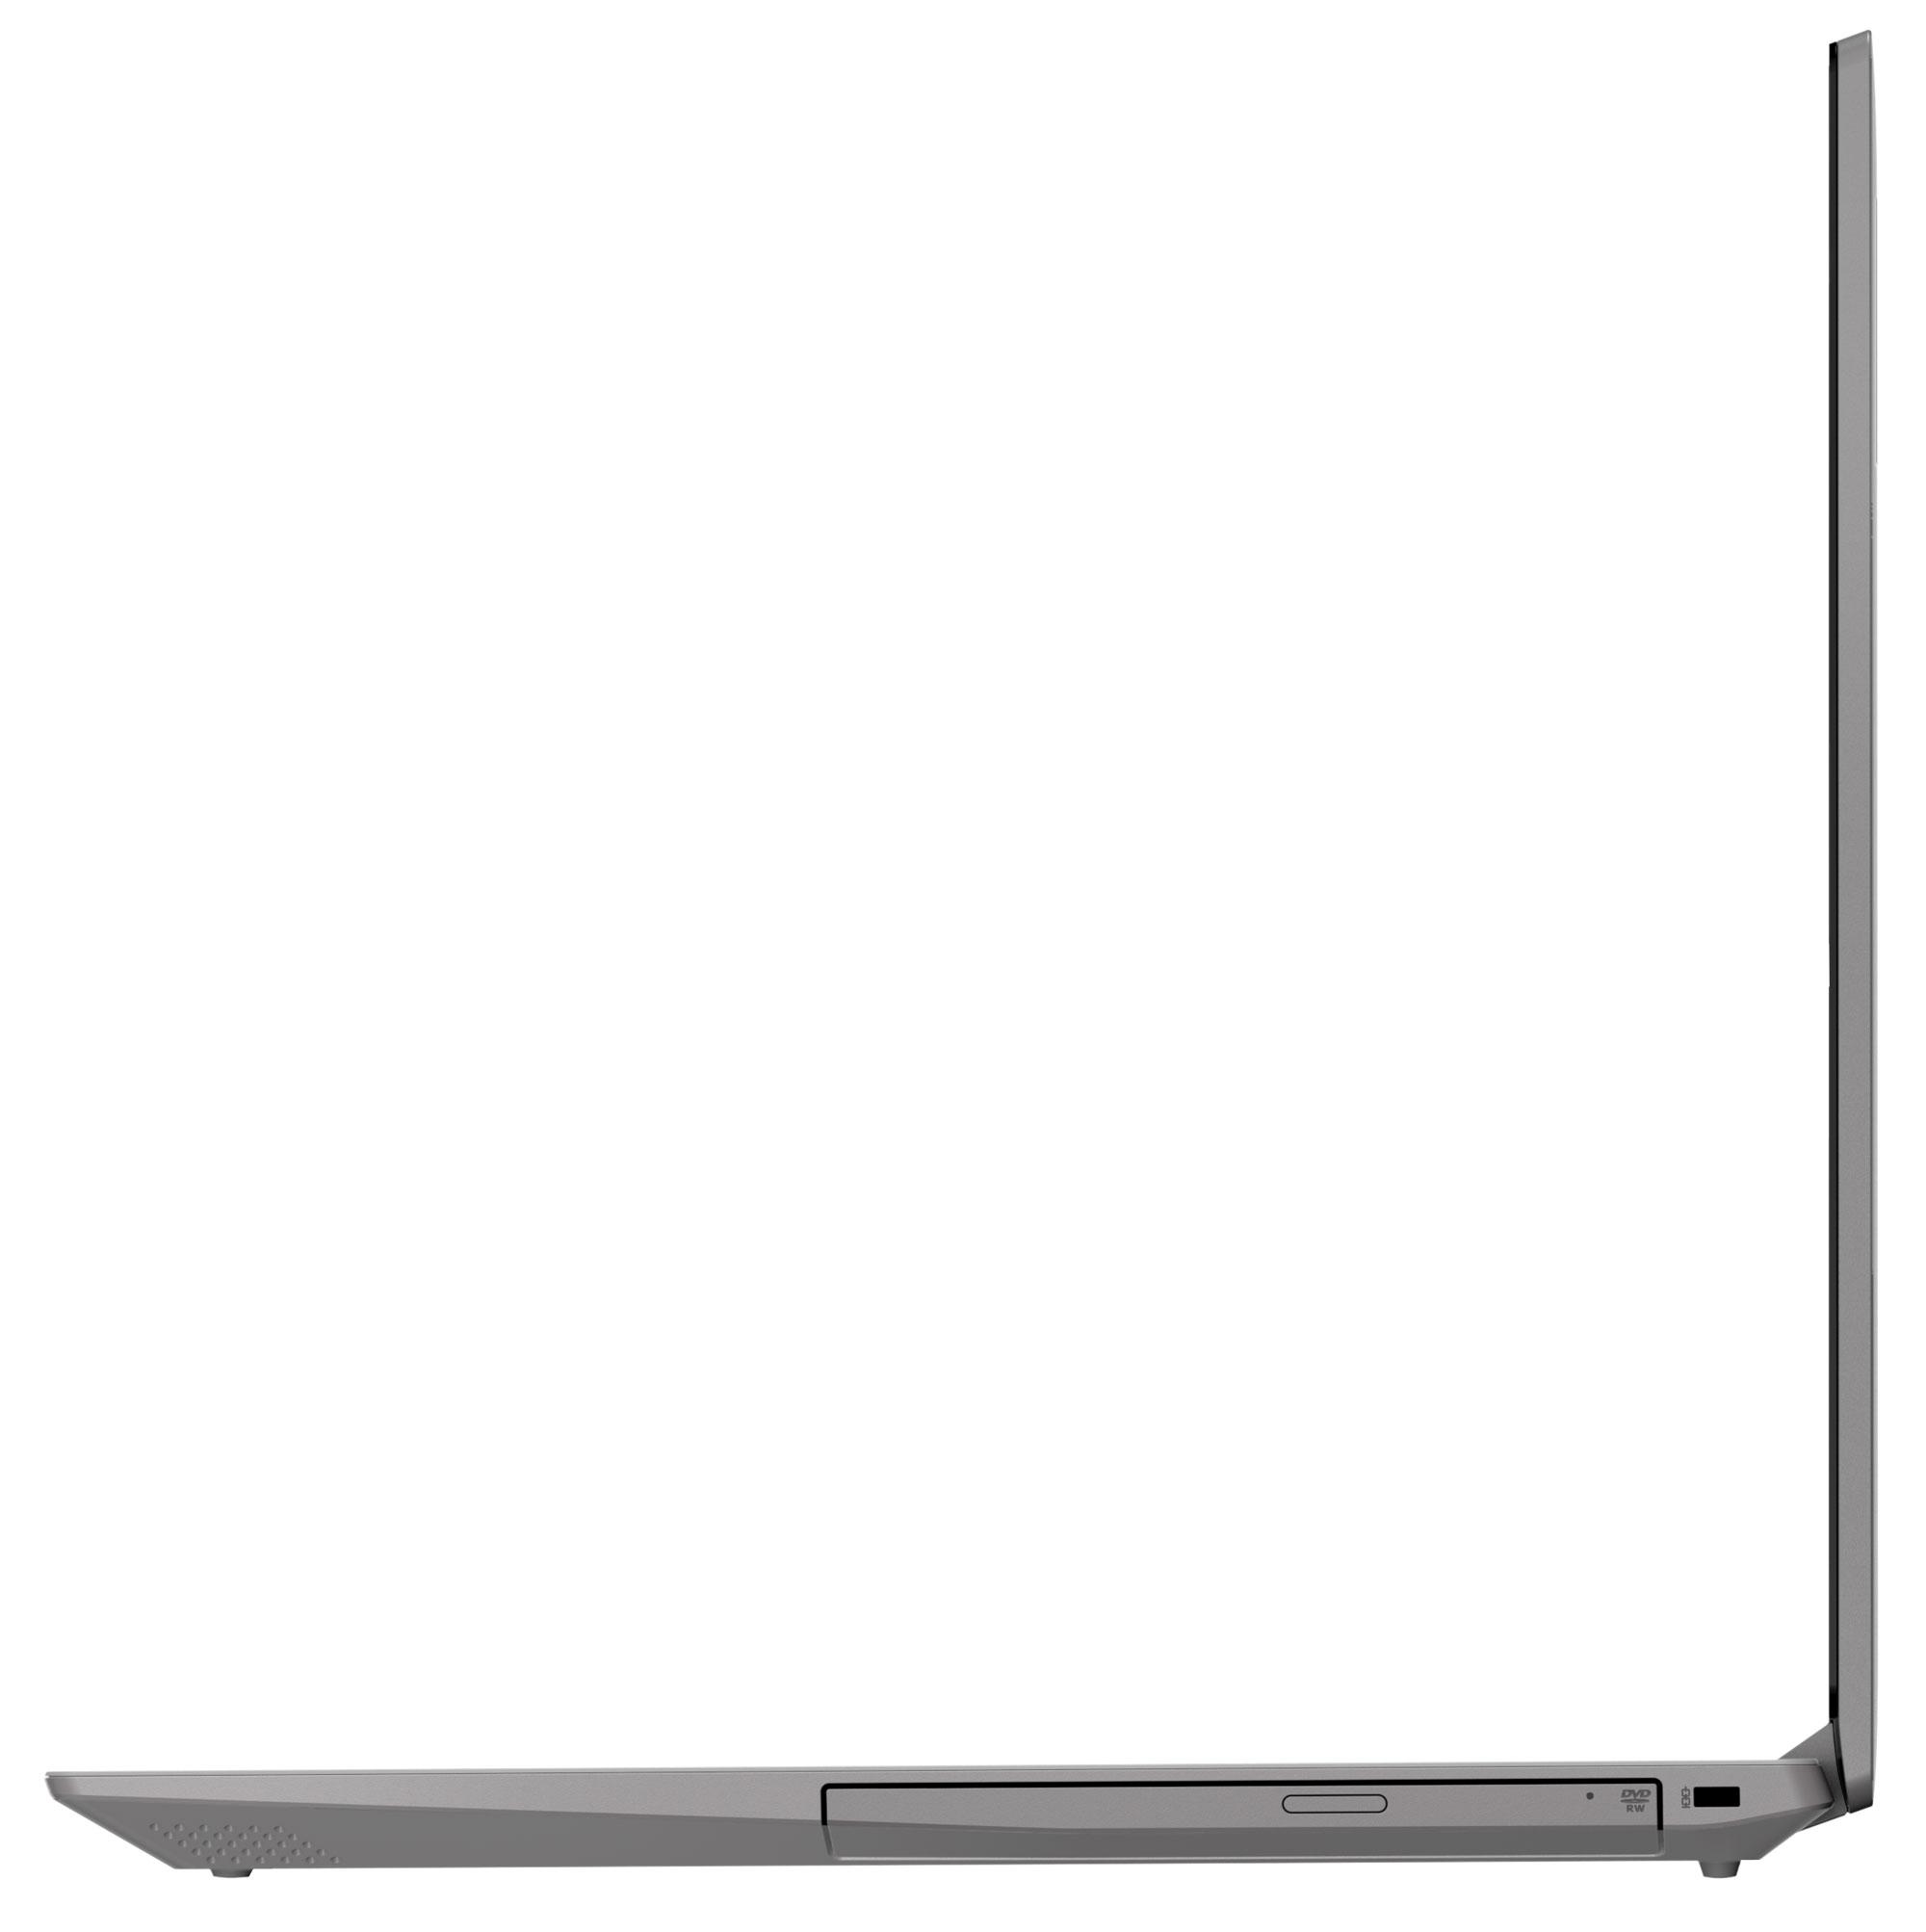 Фото  Ноутбук Lenovo ideapad L340-17IWL Platinum Grey (81M00083RE)